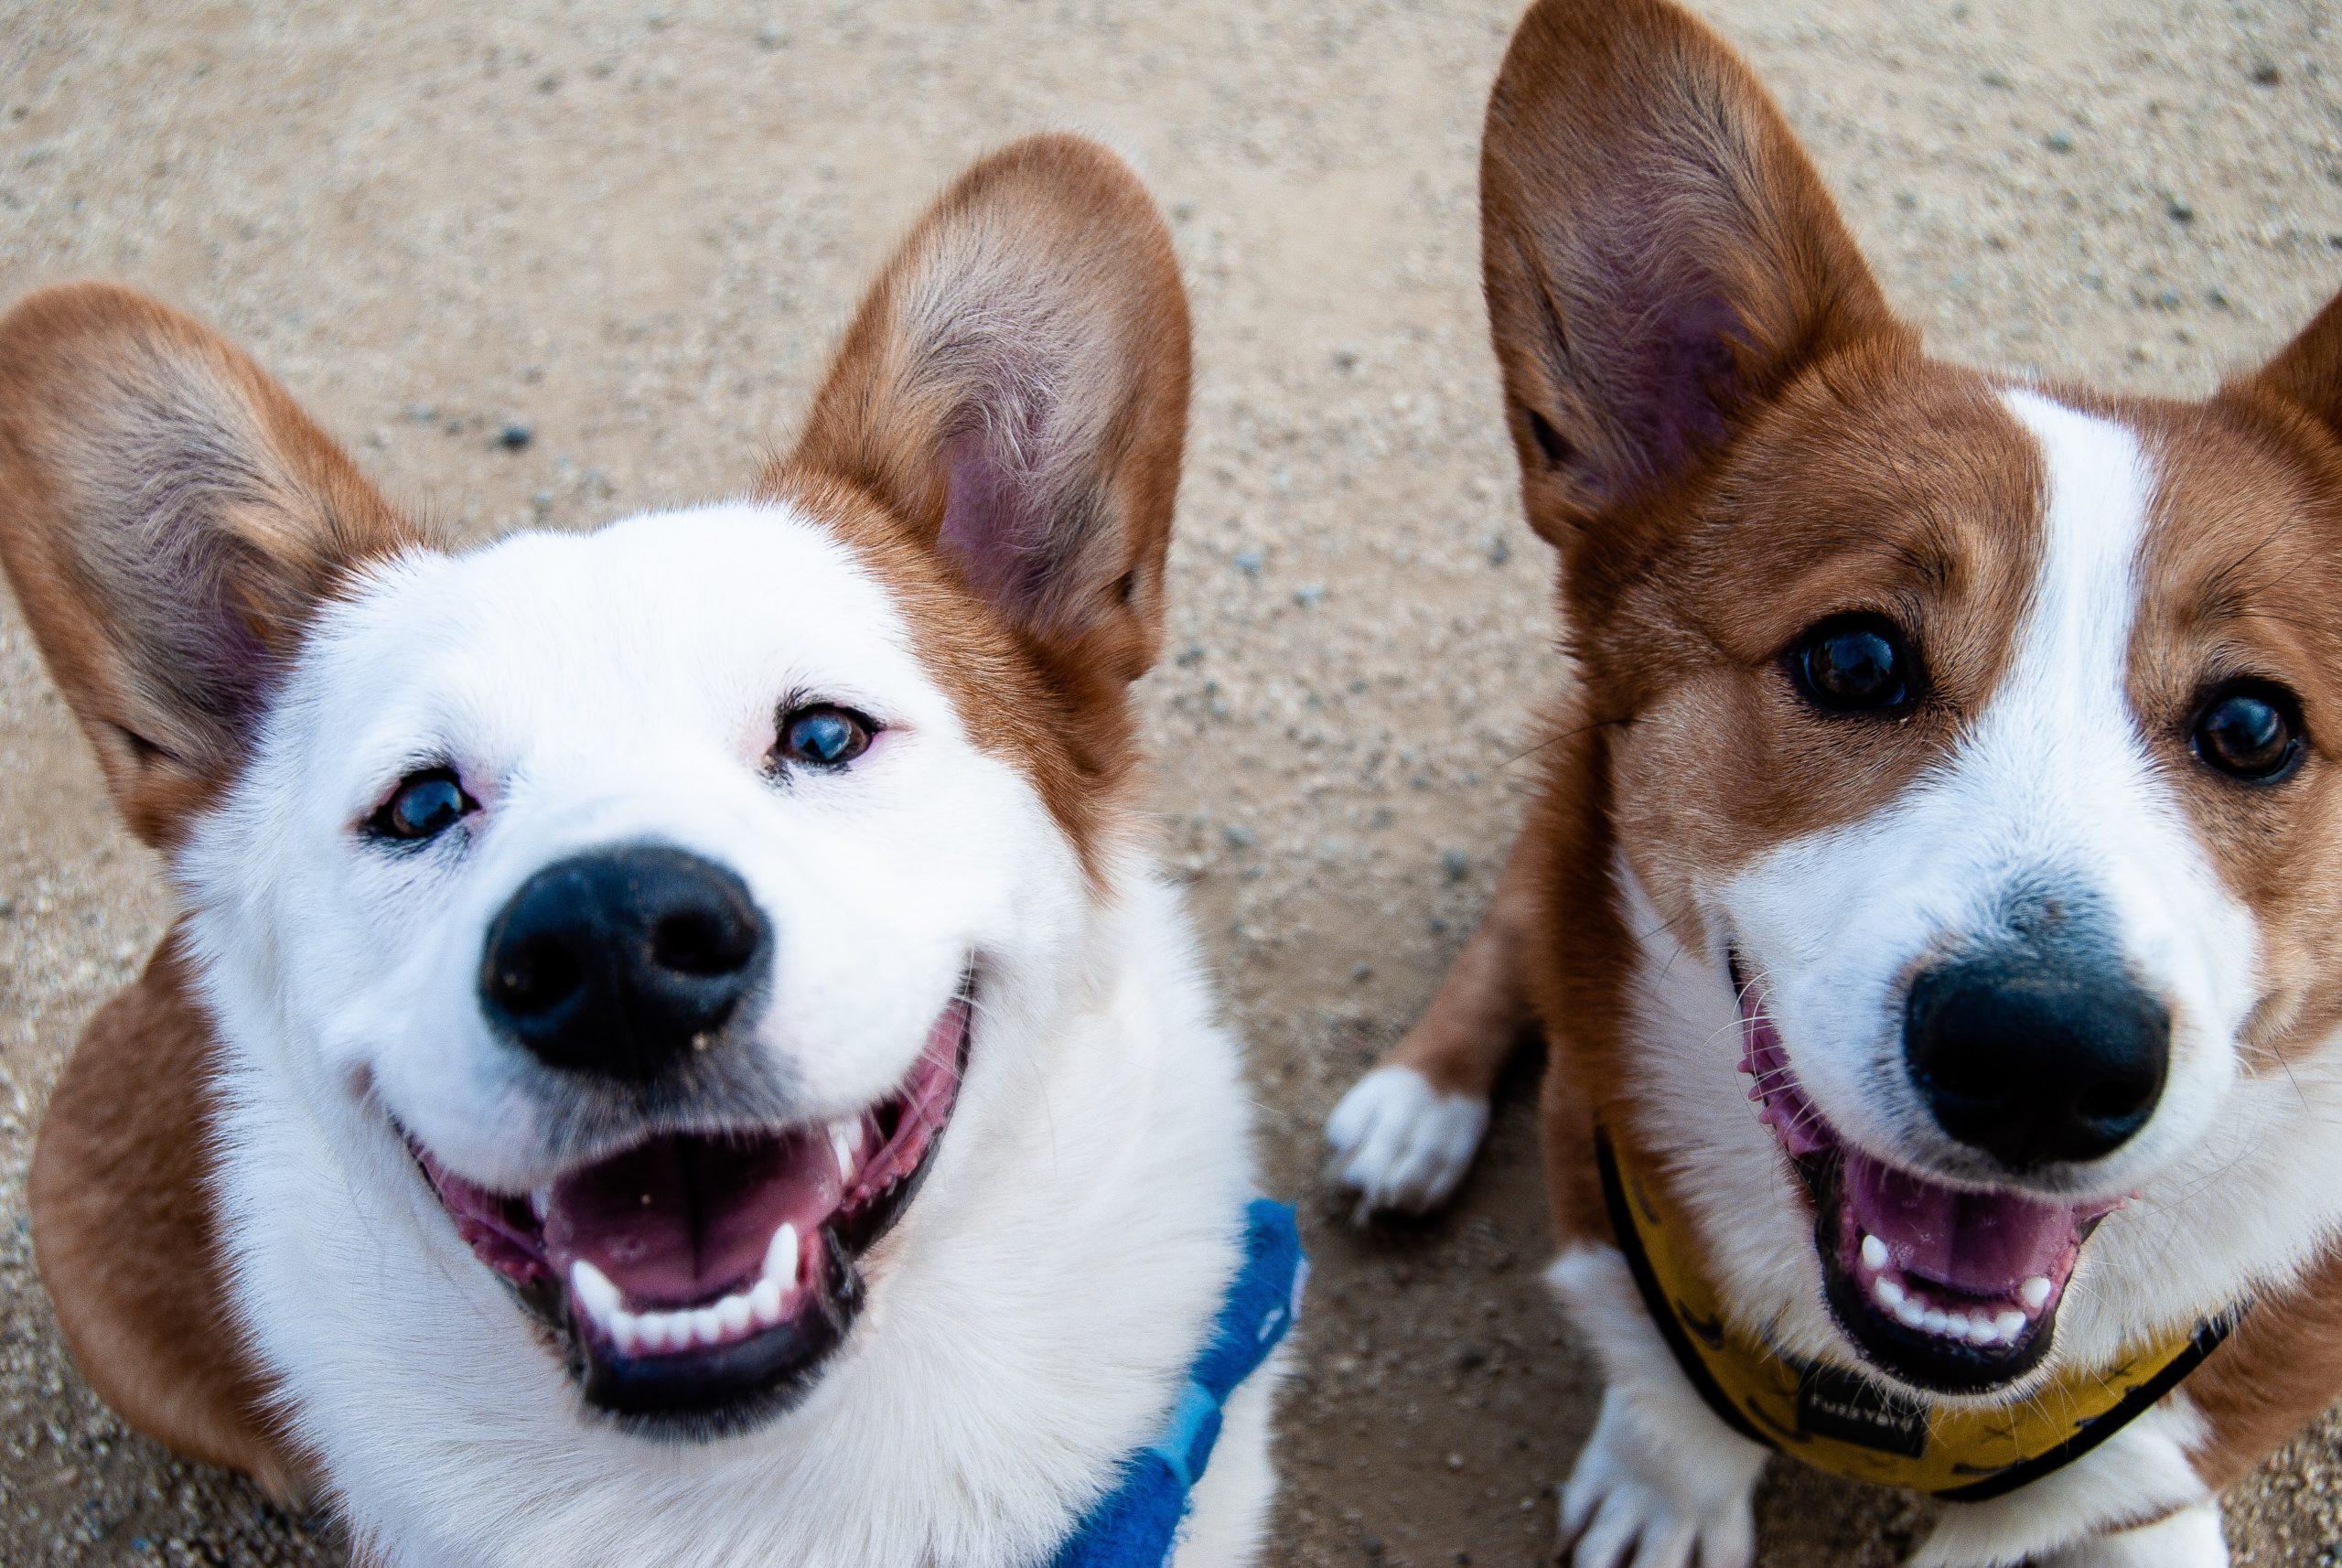 Al caldo con stile: H&M e la linea per noi e i nostri cagnolini